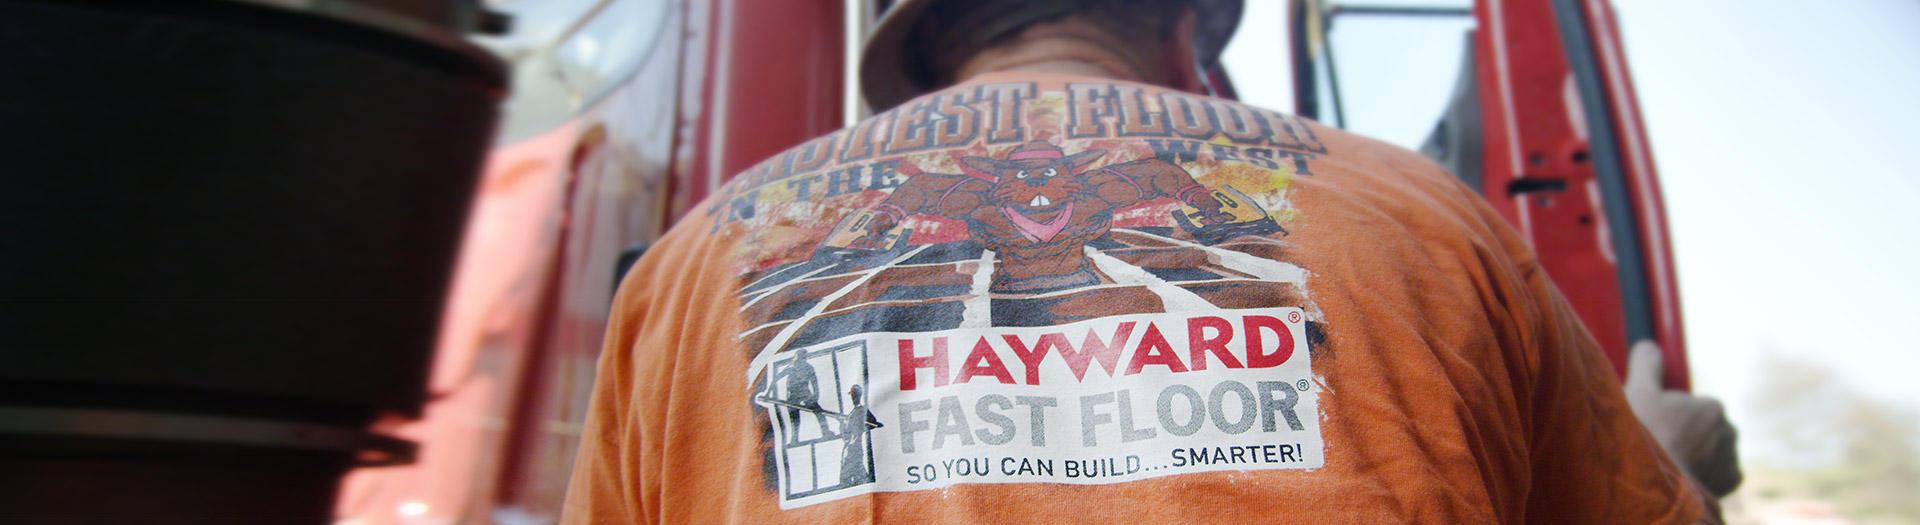 Hayward Lumber - Redwood City image 6